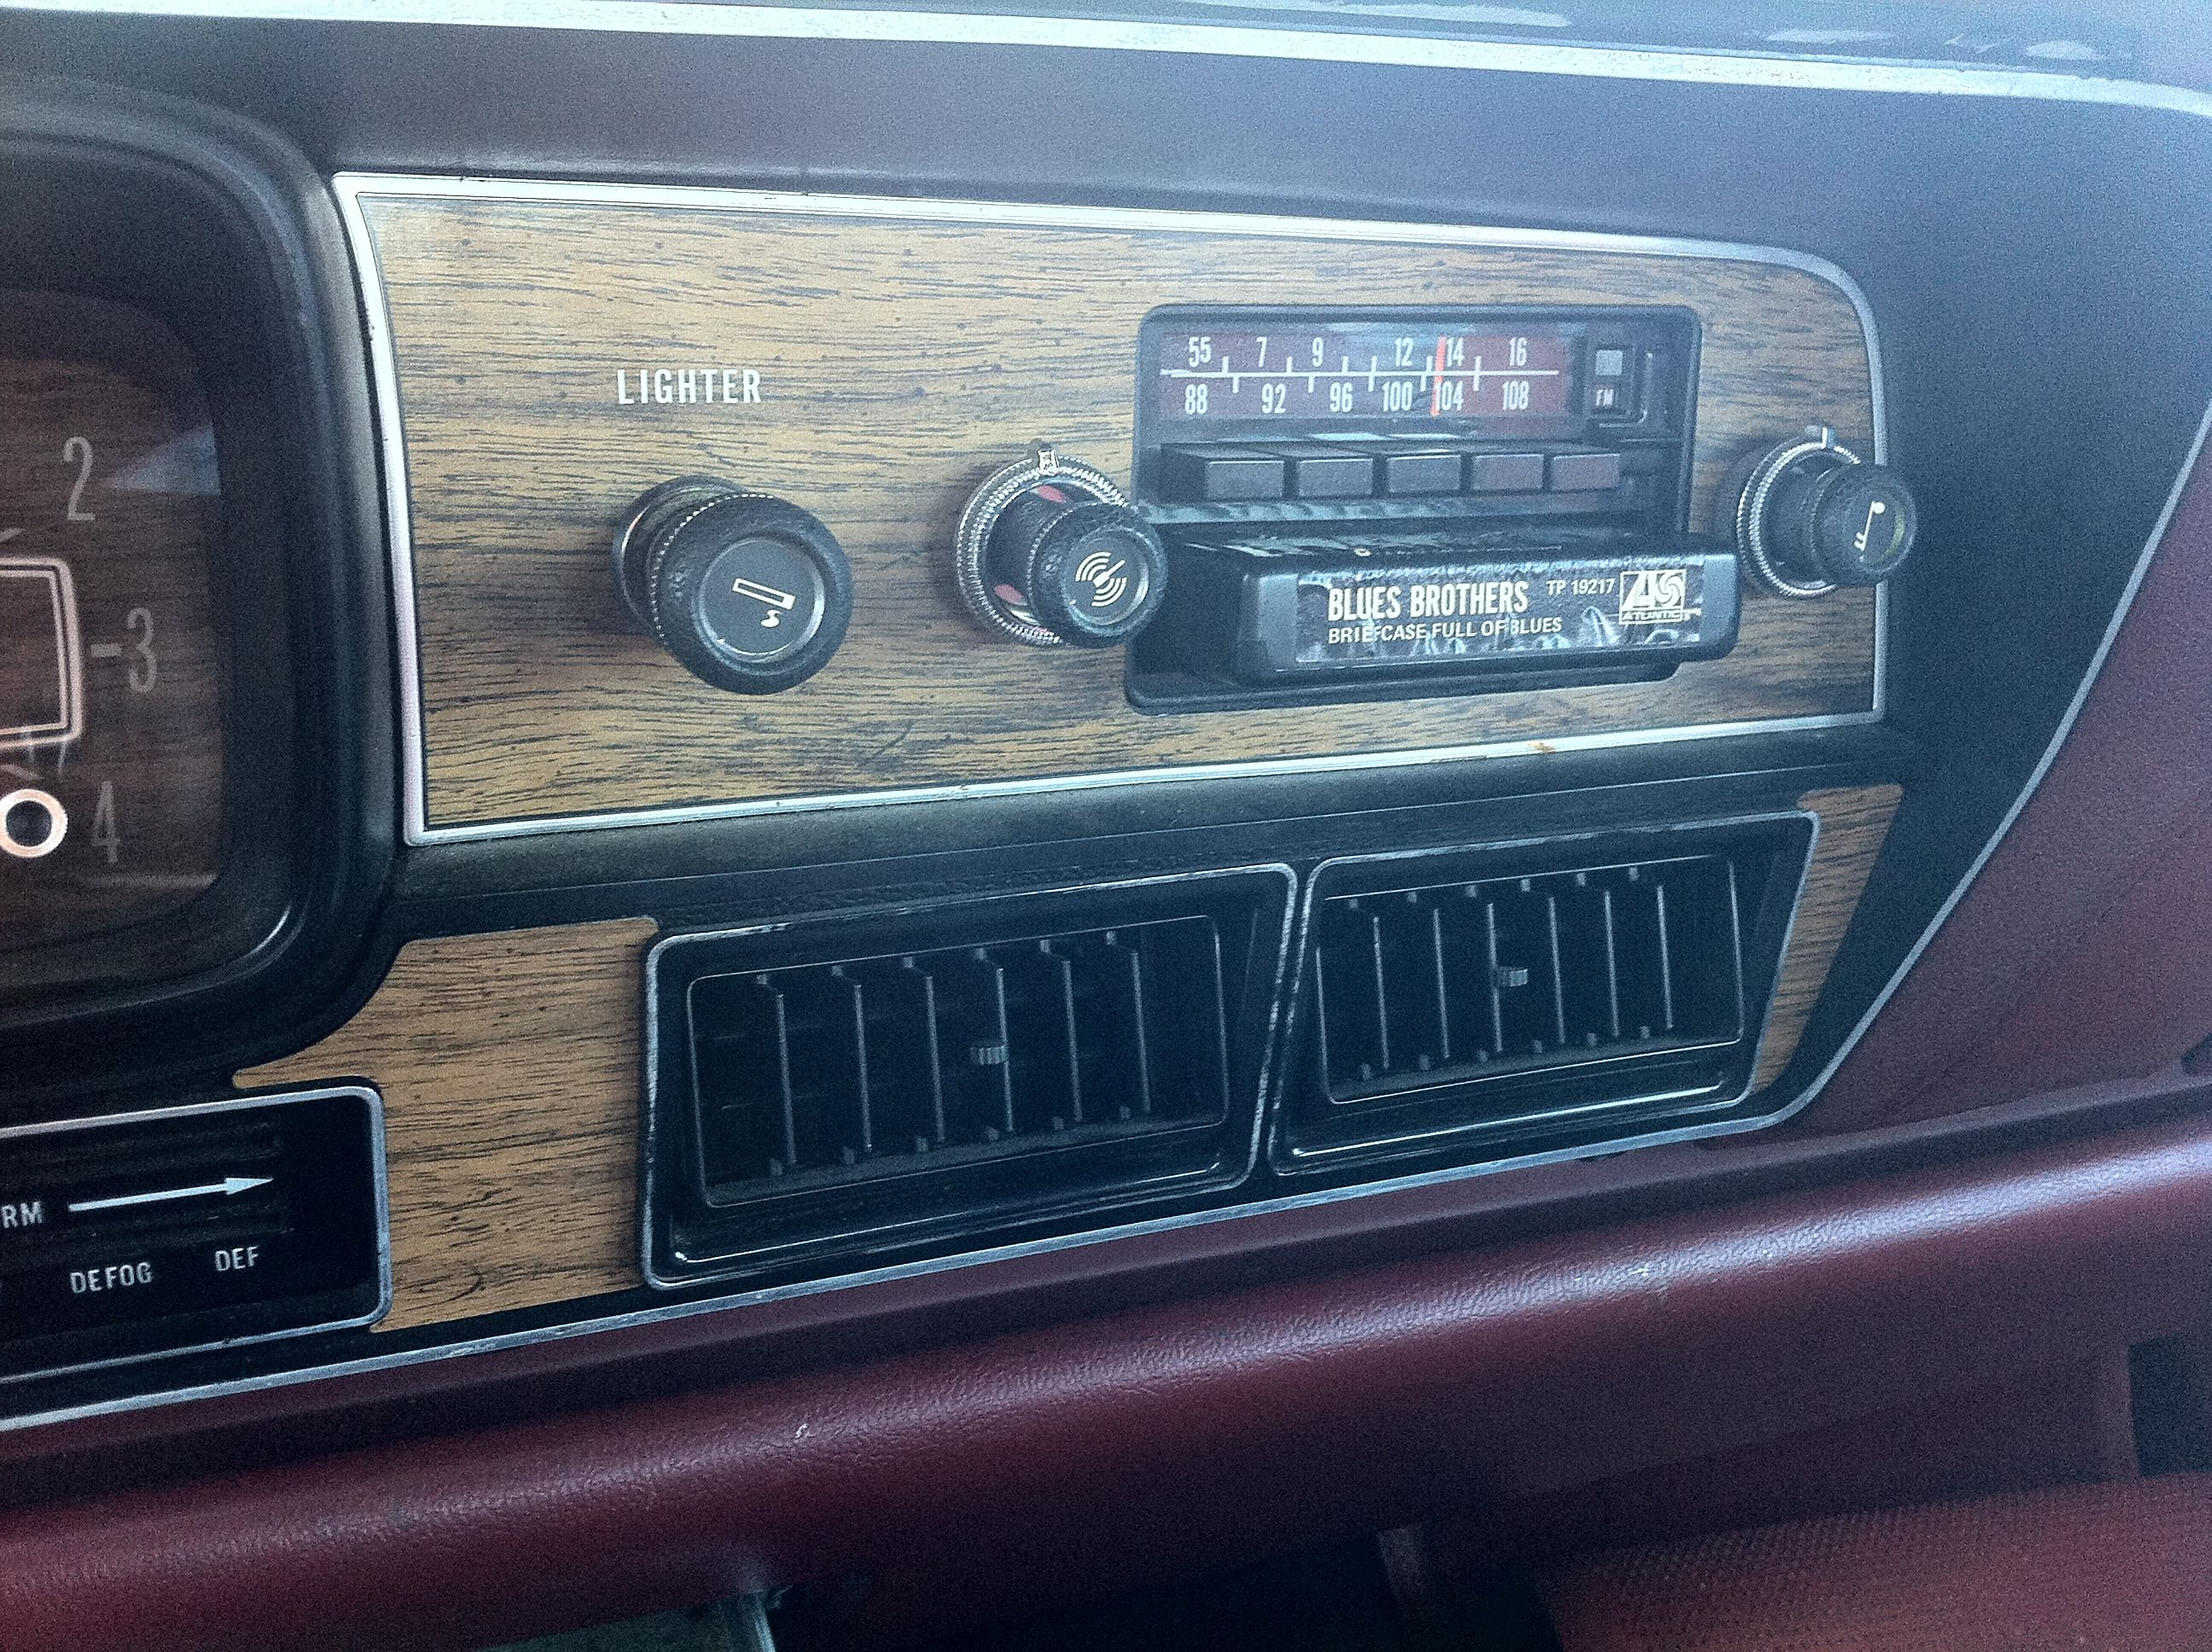 [Image: 1978_AMC_Matador_sedan_red_NC_detail_of_...k_unit.jpg]